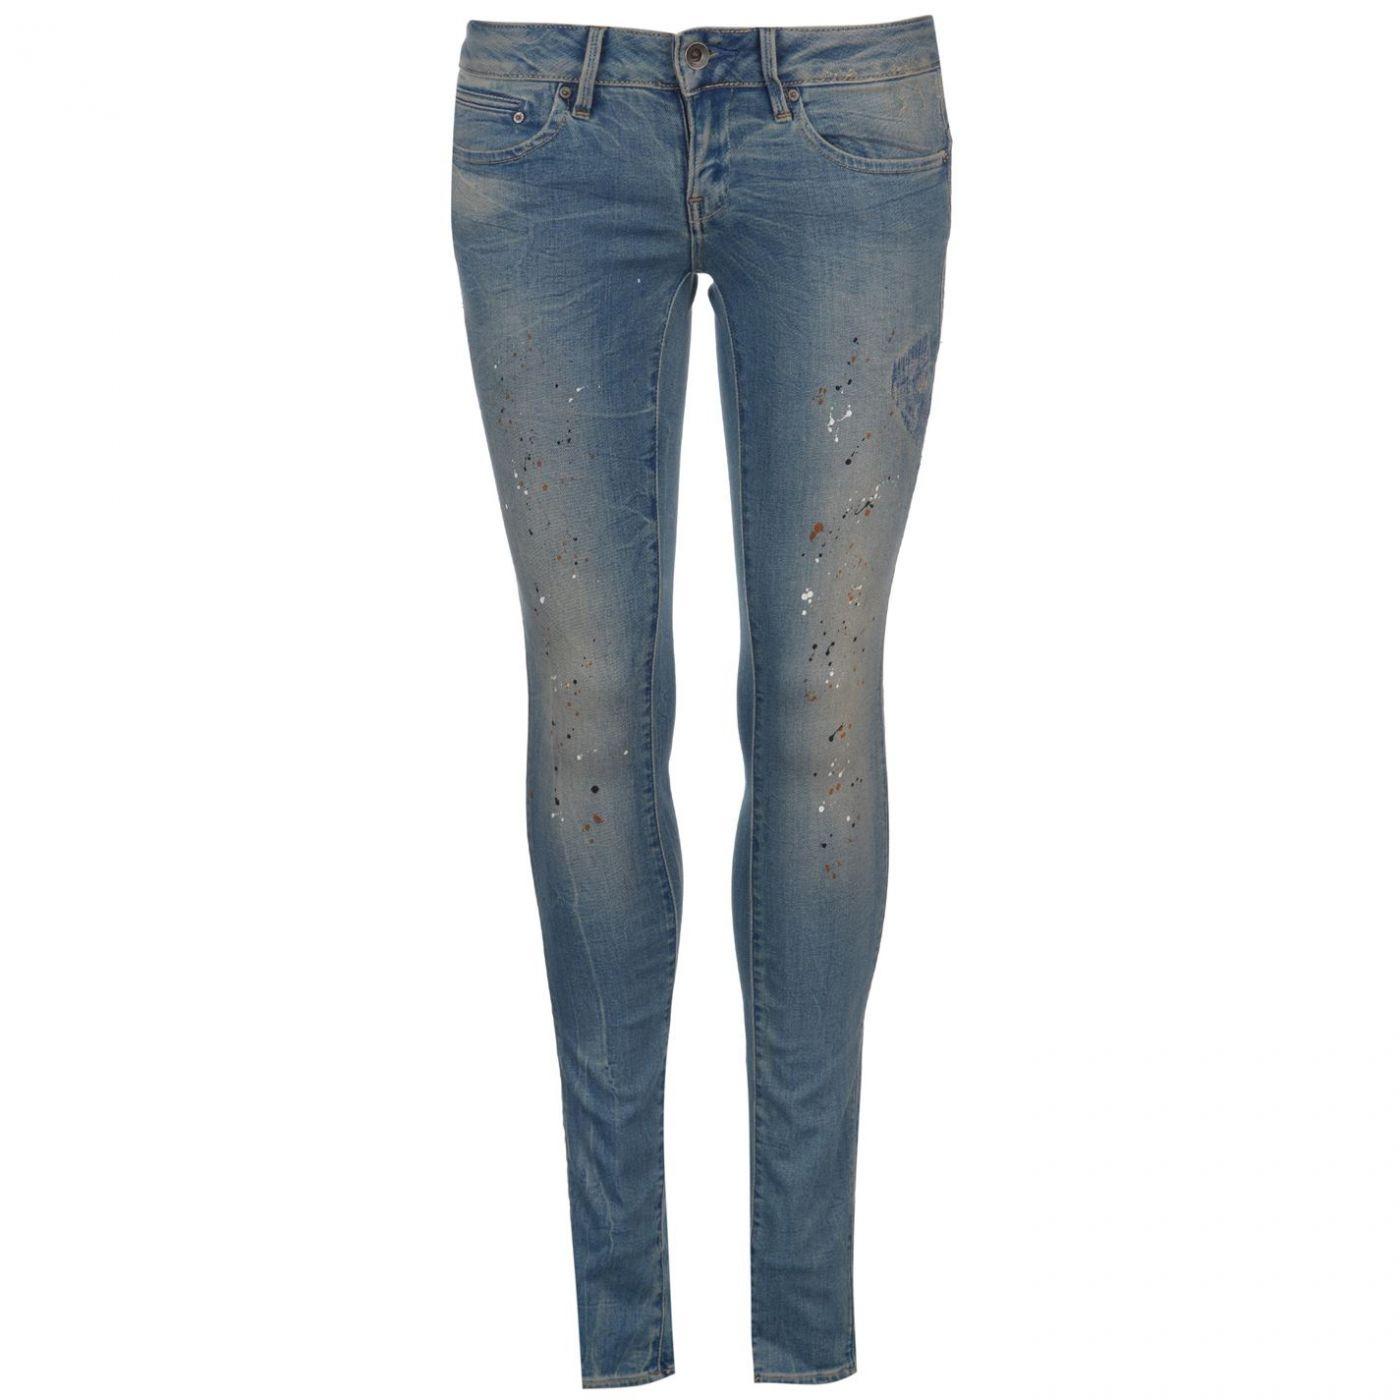 G Star Midge Low Super Skinny Jeans Womens